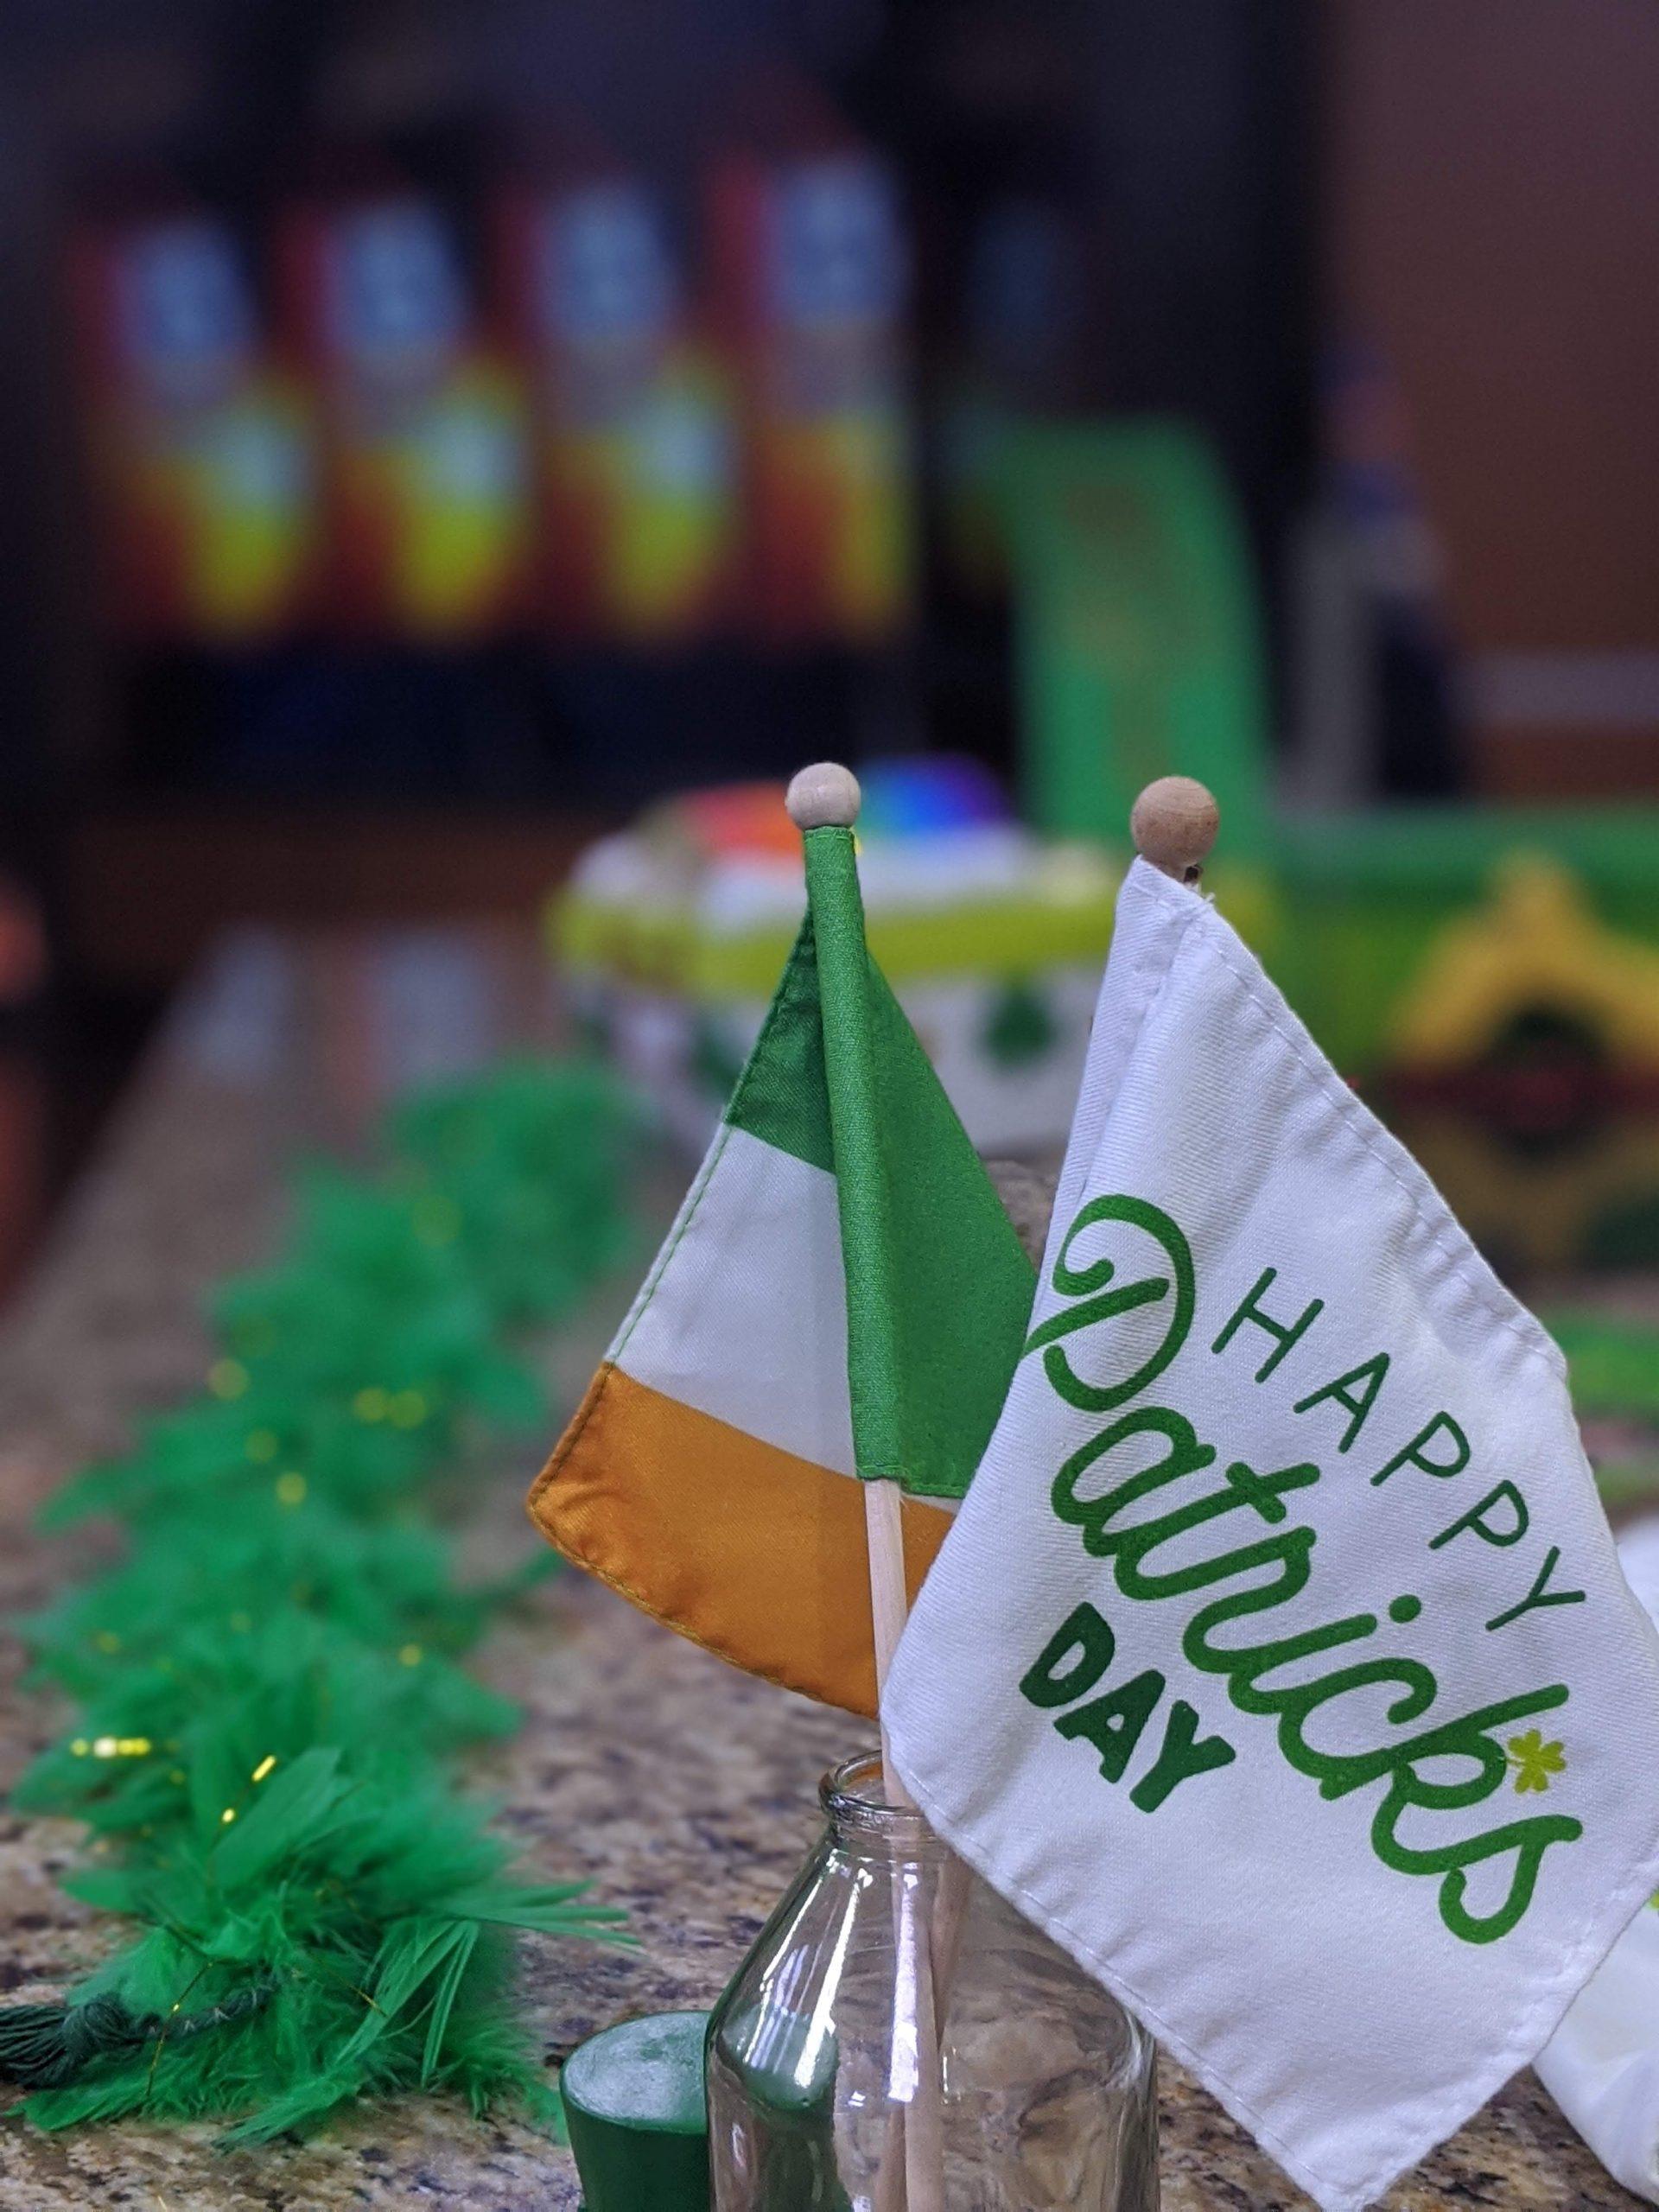 DIY St. Patrick's Day crafts